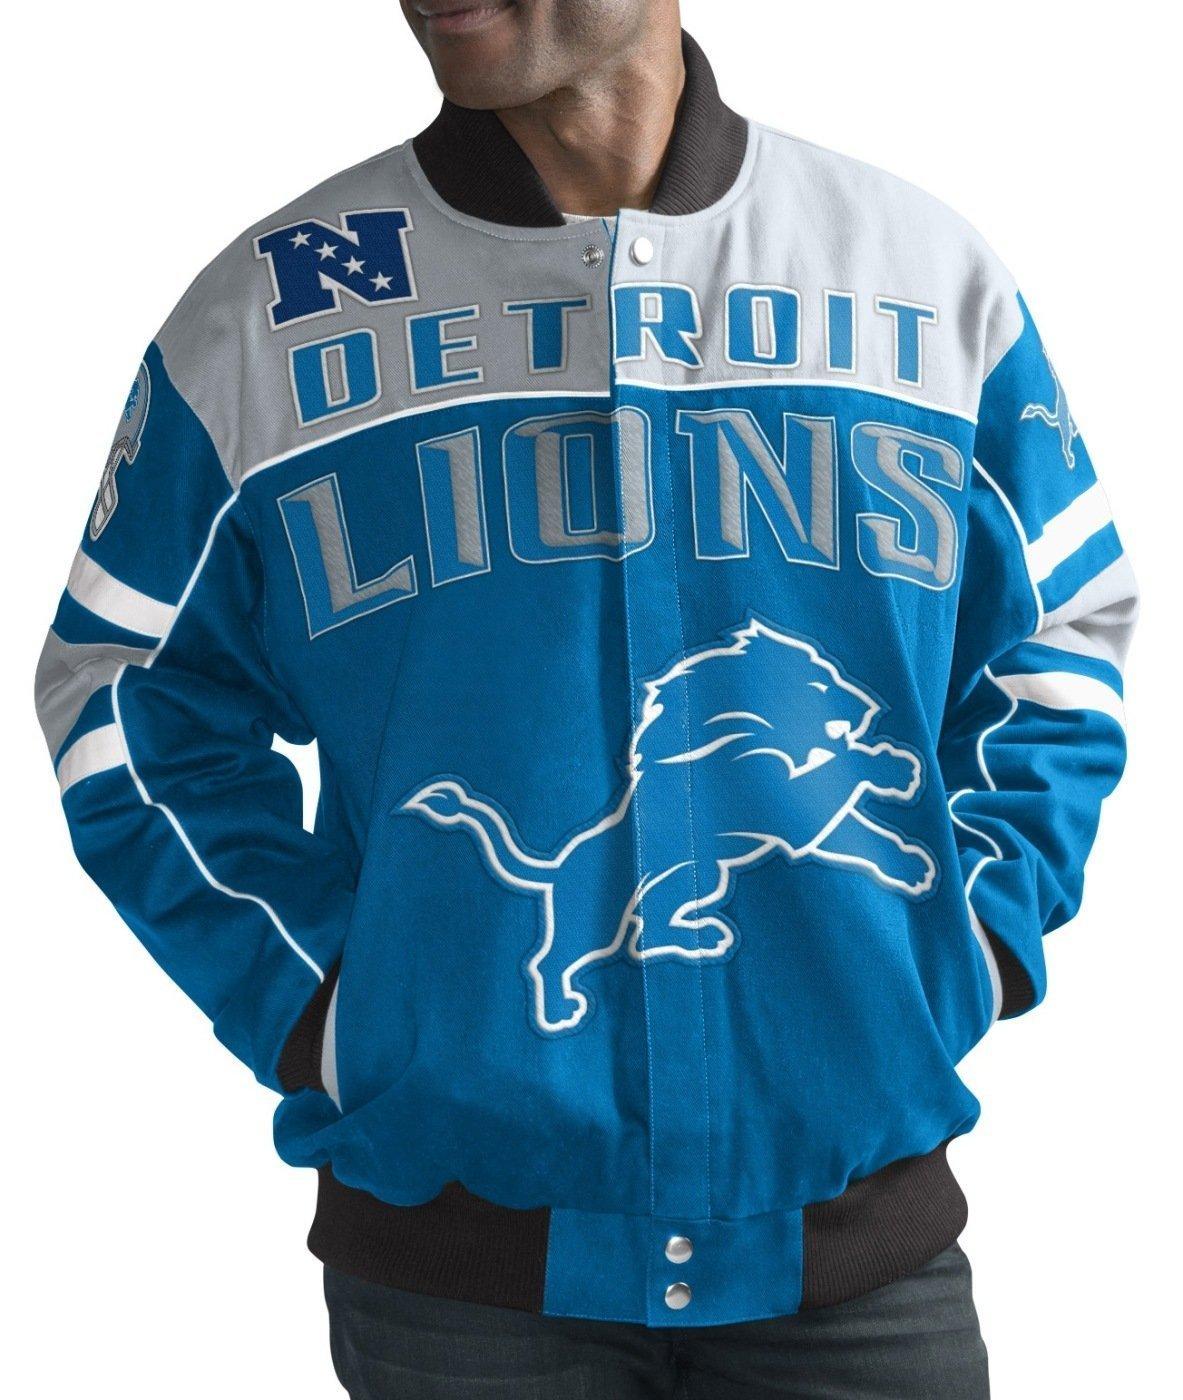 G-III Sports Detroit Lions Men's Blitz Premium Cotton Twill Jacket